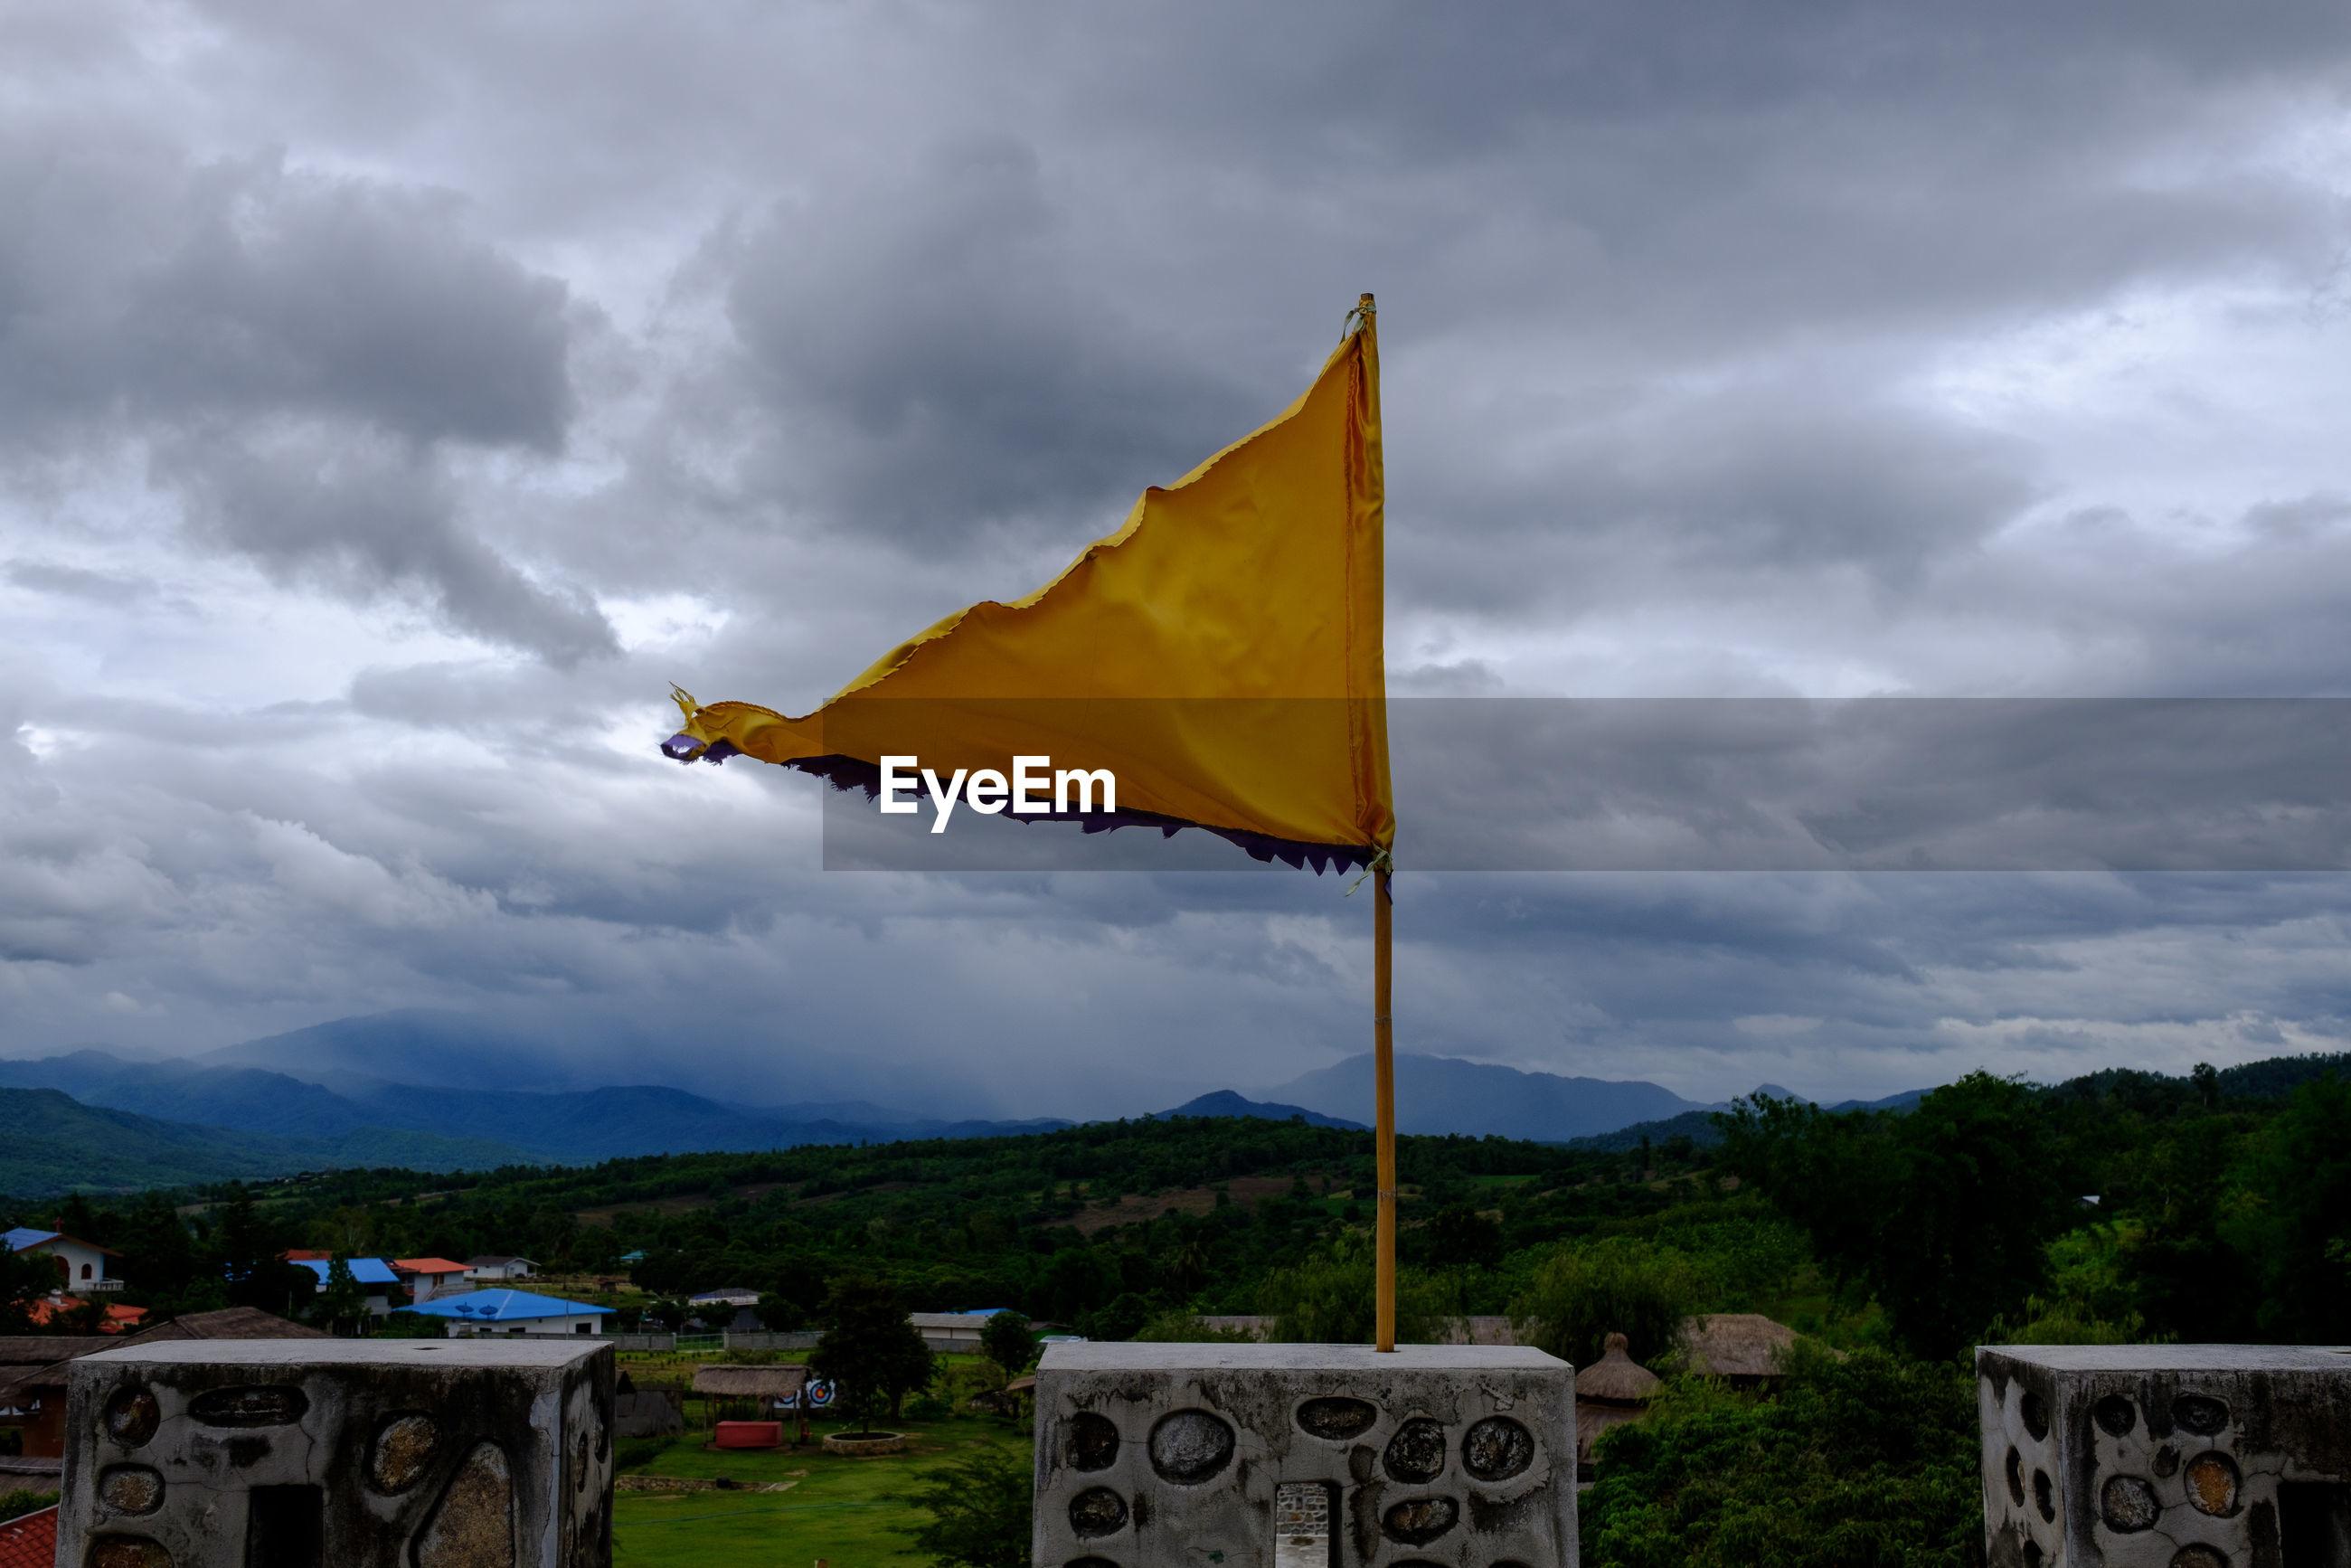 YELLOW FLAG AGAINST CLOUDY SKY